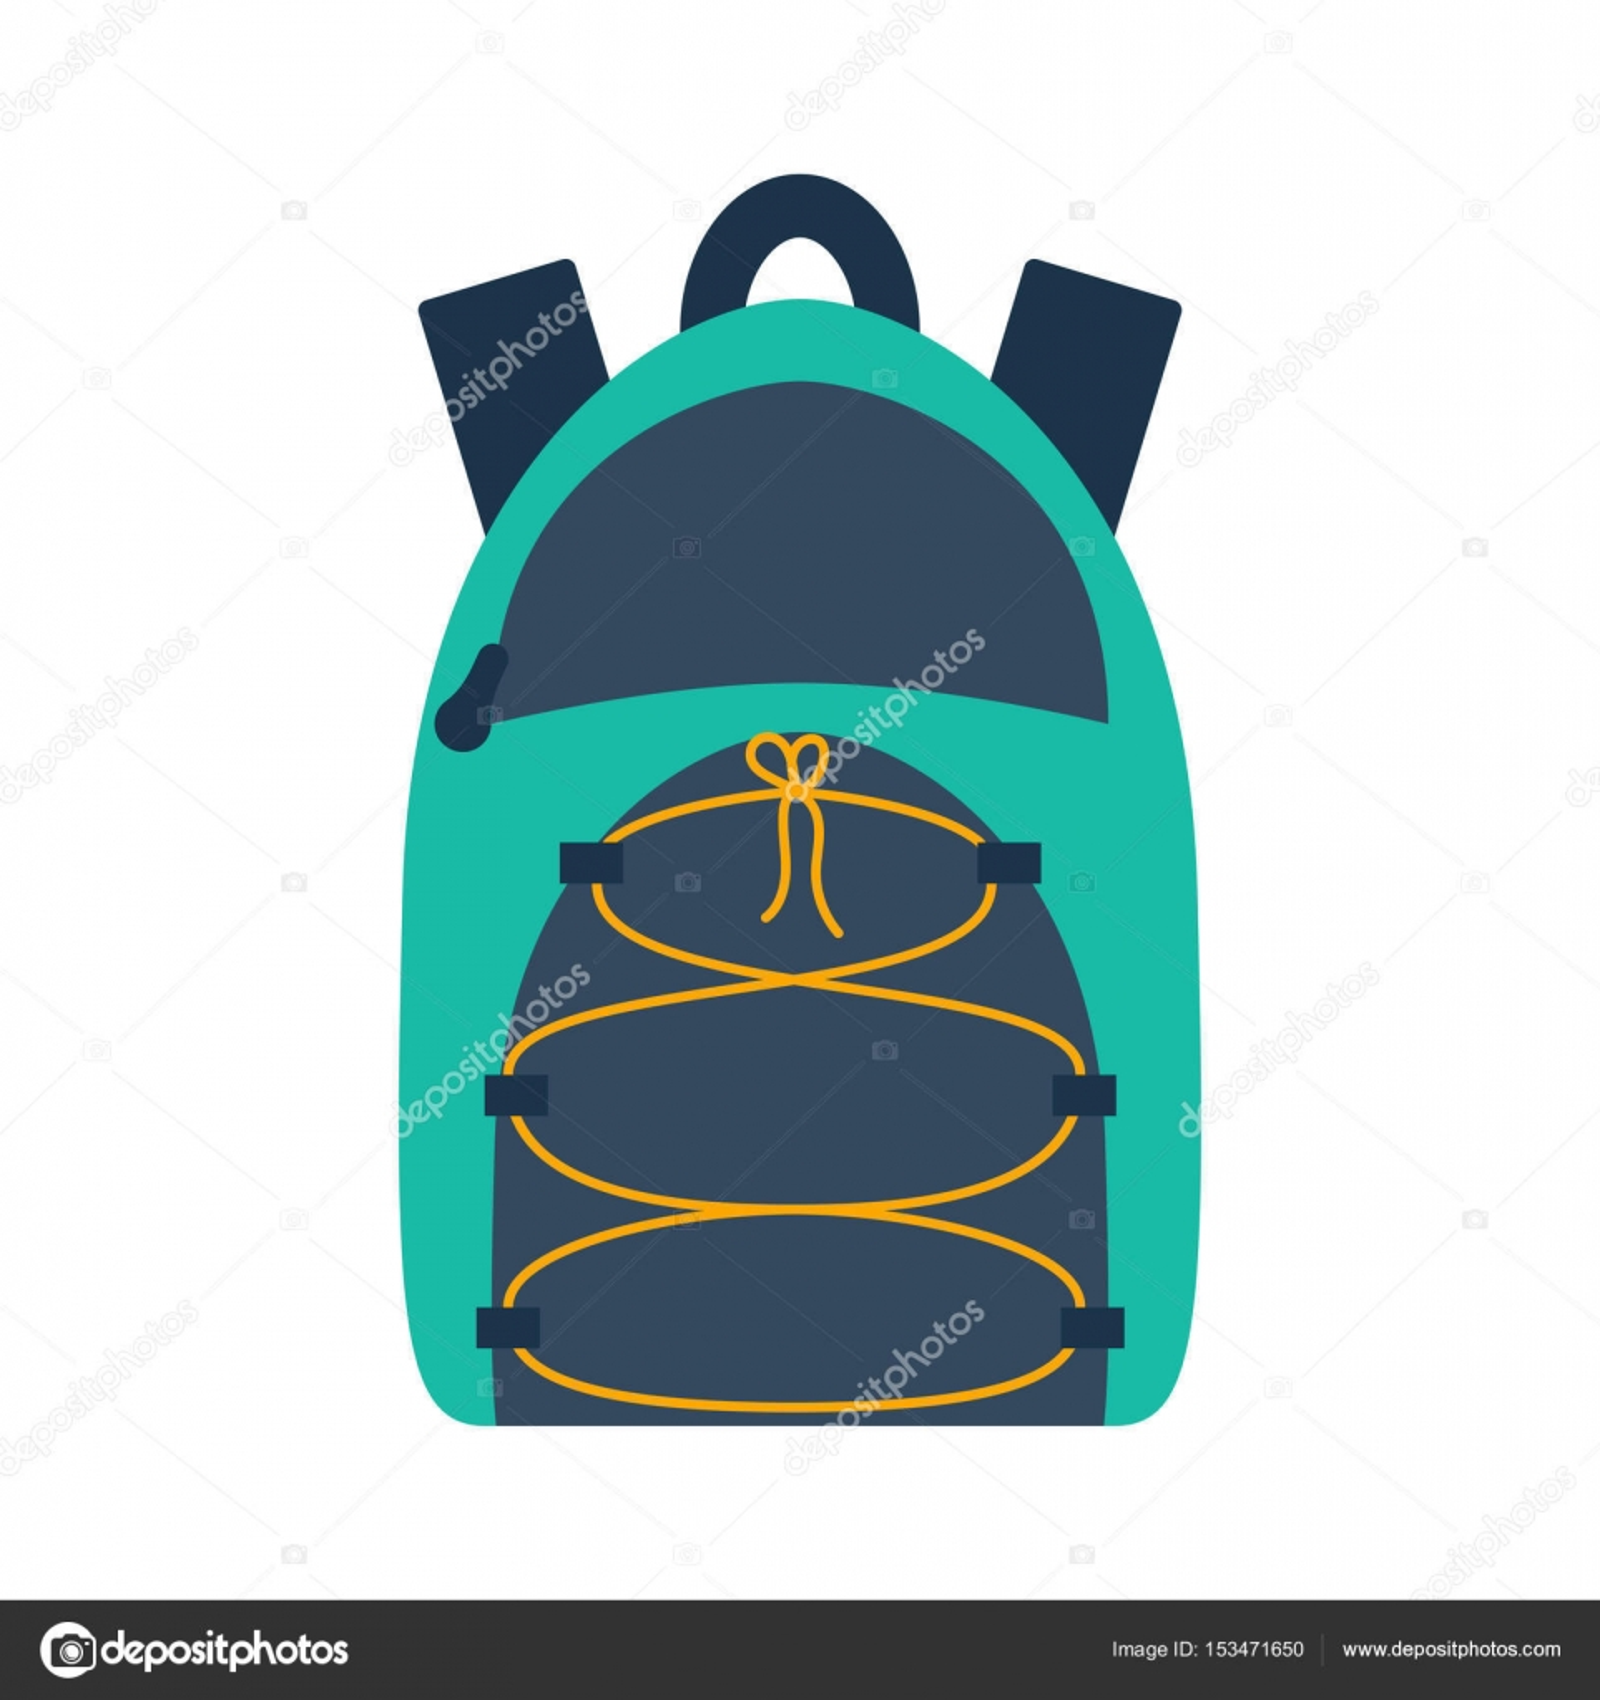 9cda33d371 Διάνυσμα κινουμένων σχεδίων επίπεδη άθλημα ή backpack σχολείο–  εικονογράφηση αρχείου